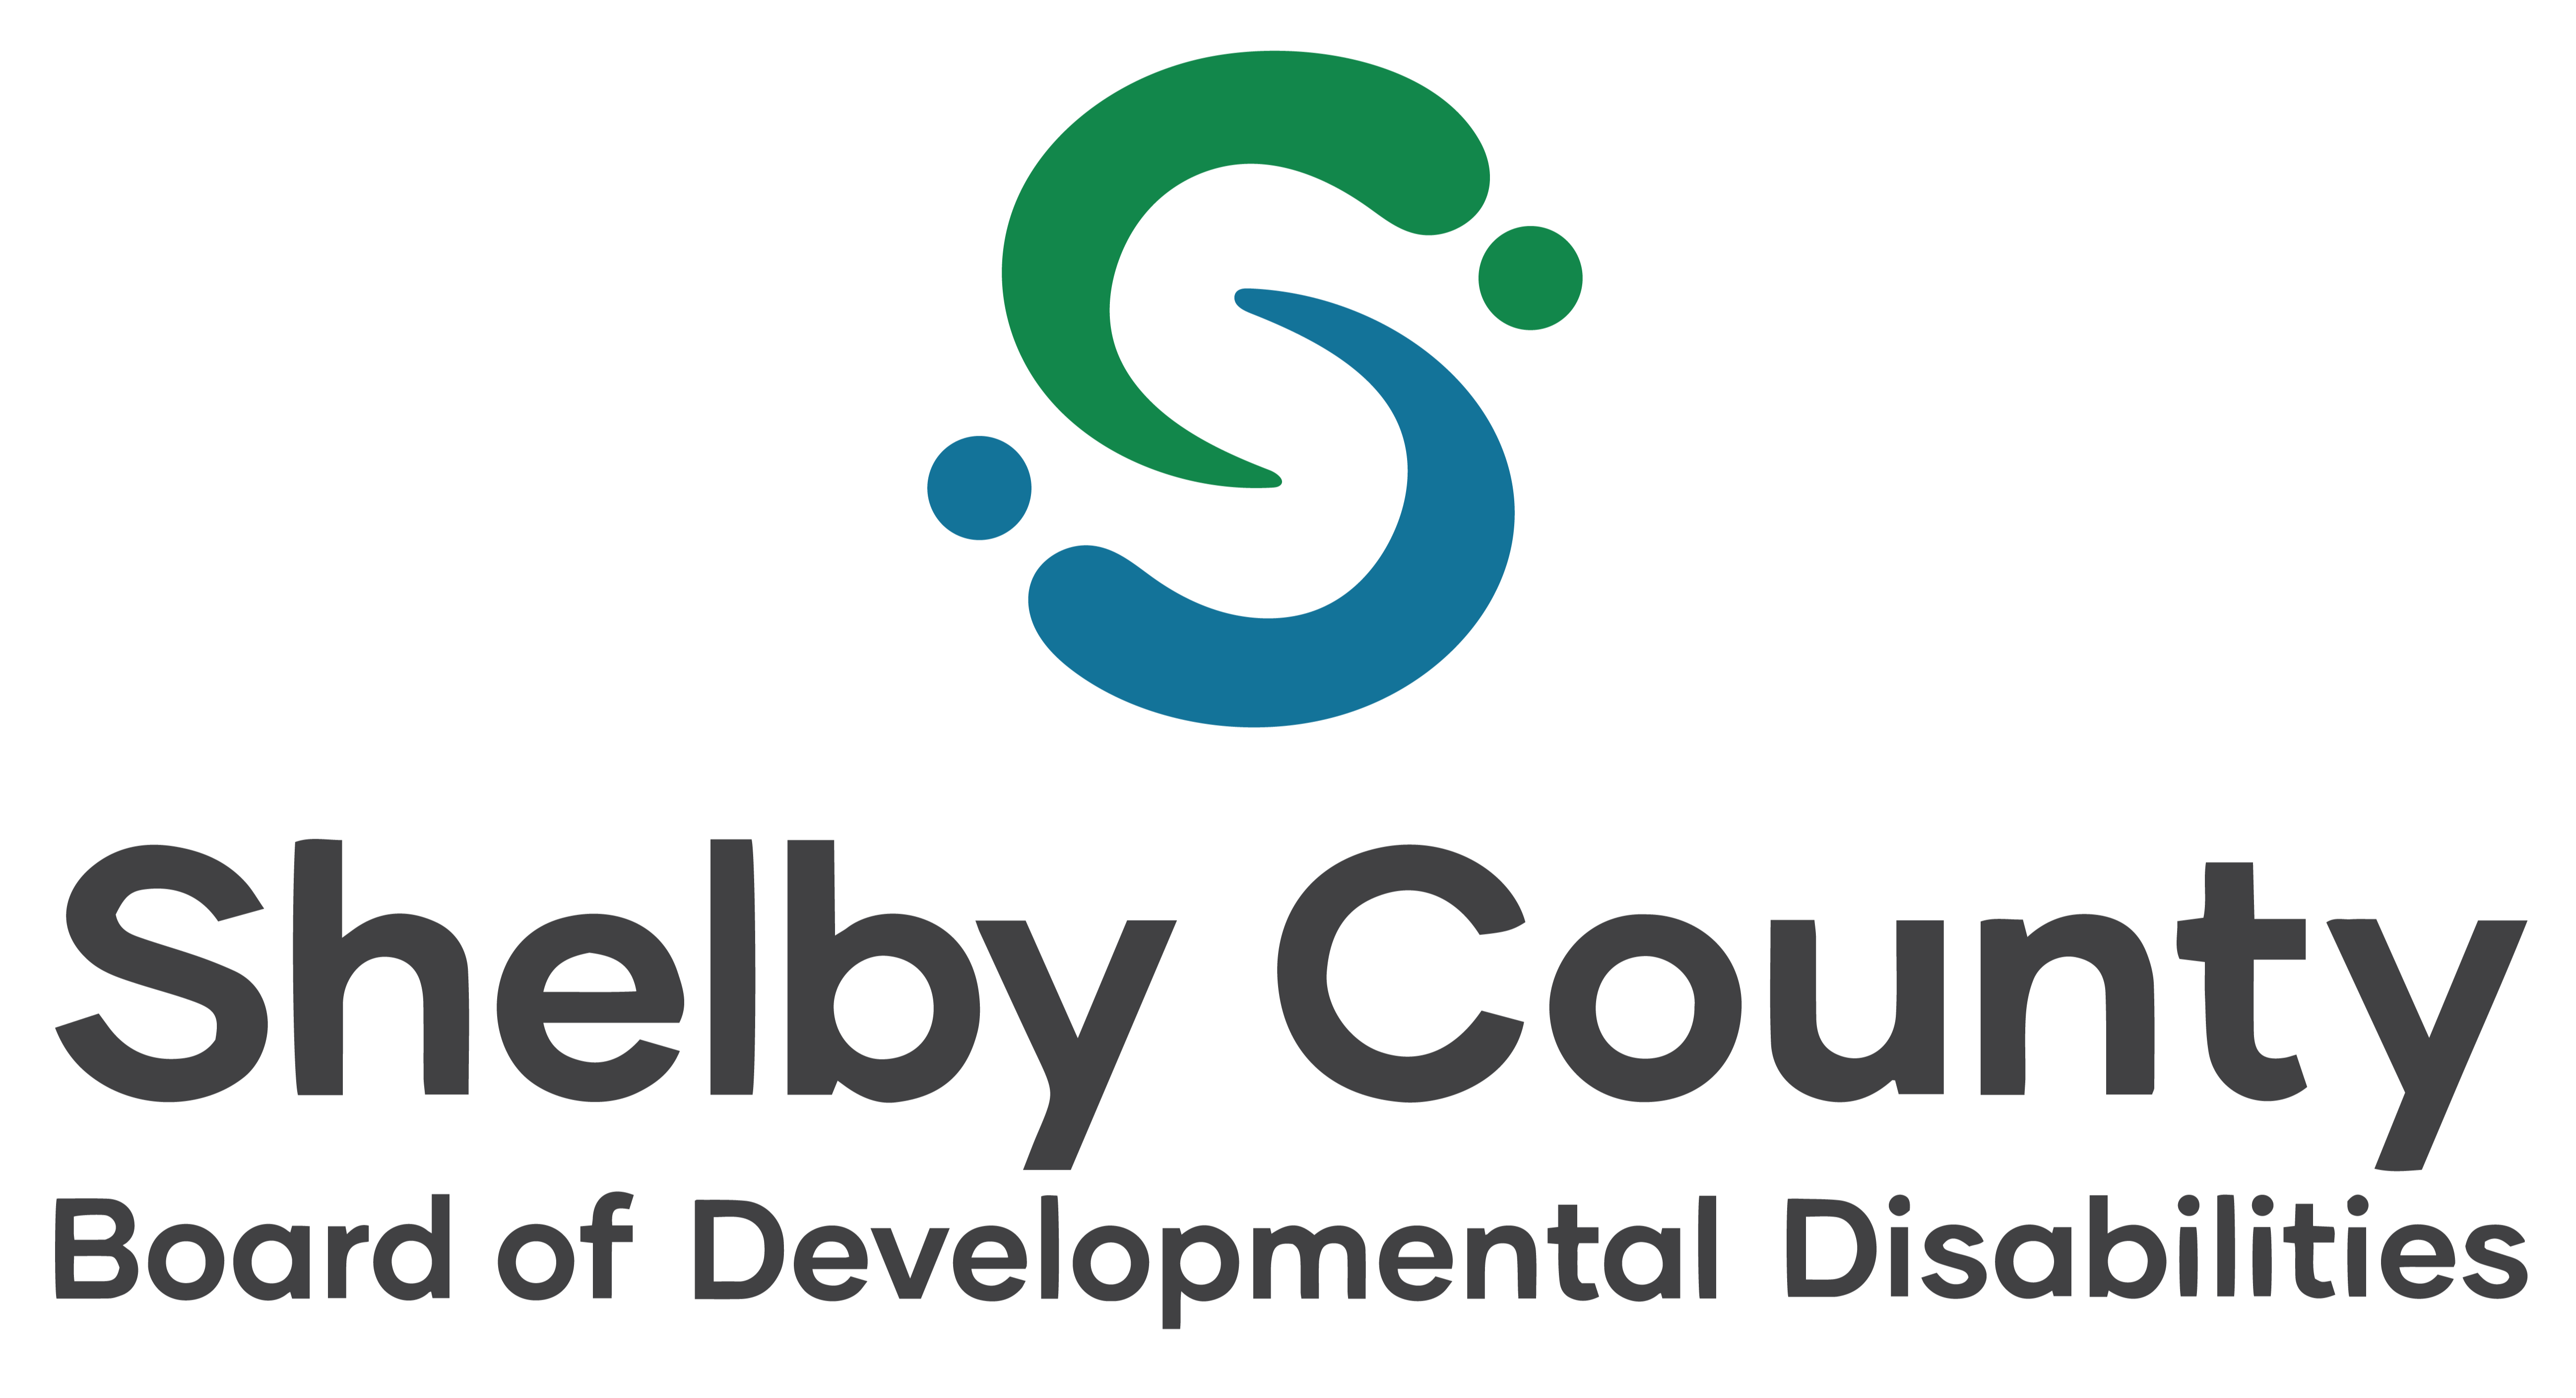 SCBDD Logo